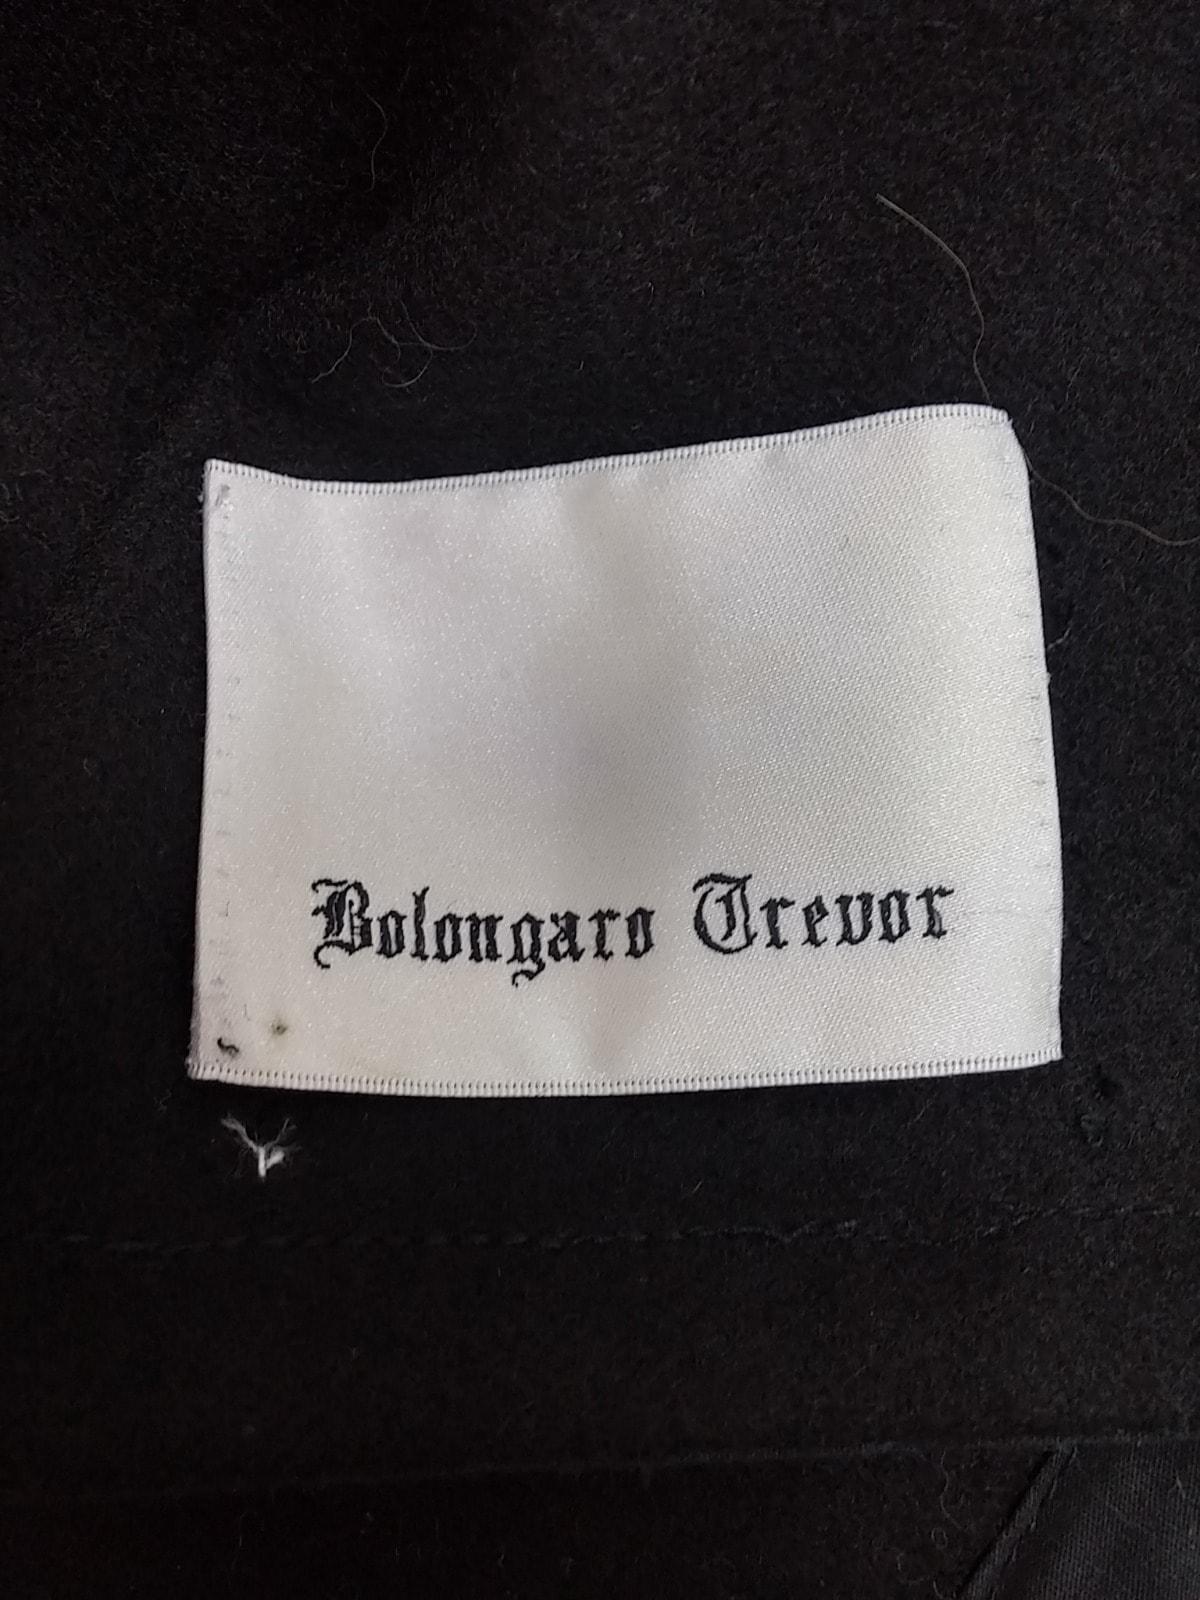 BOLONGARO TREVOR(ボロンガロ トレヴァー)のポンチョ